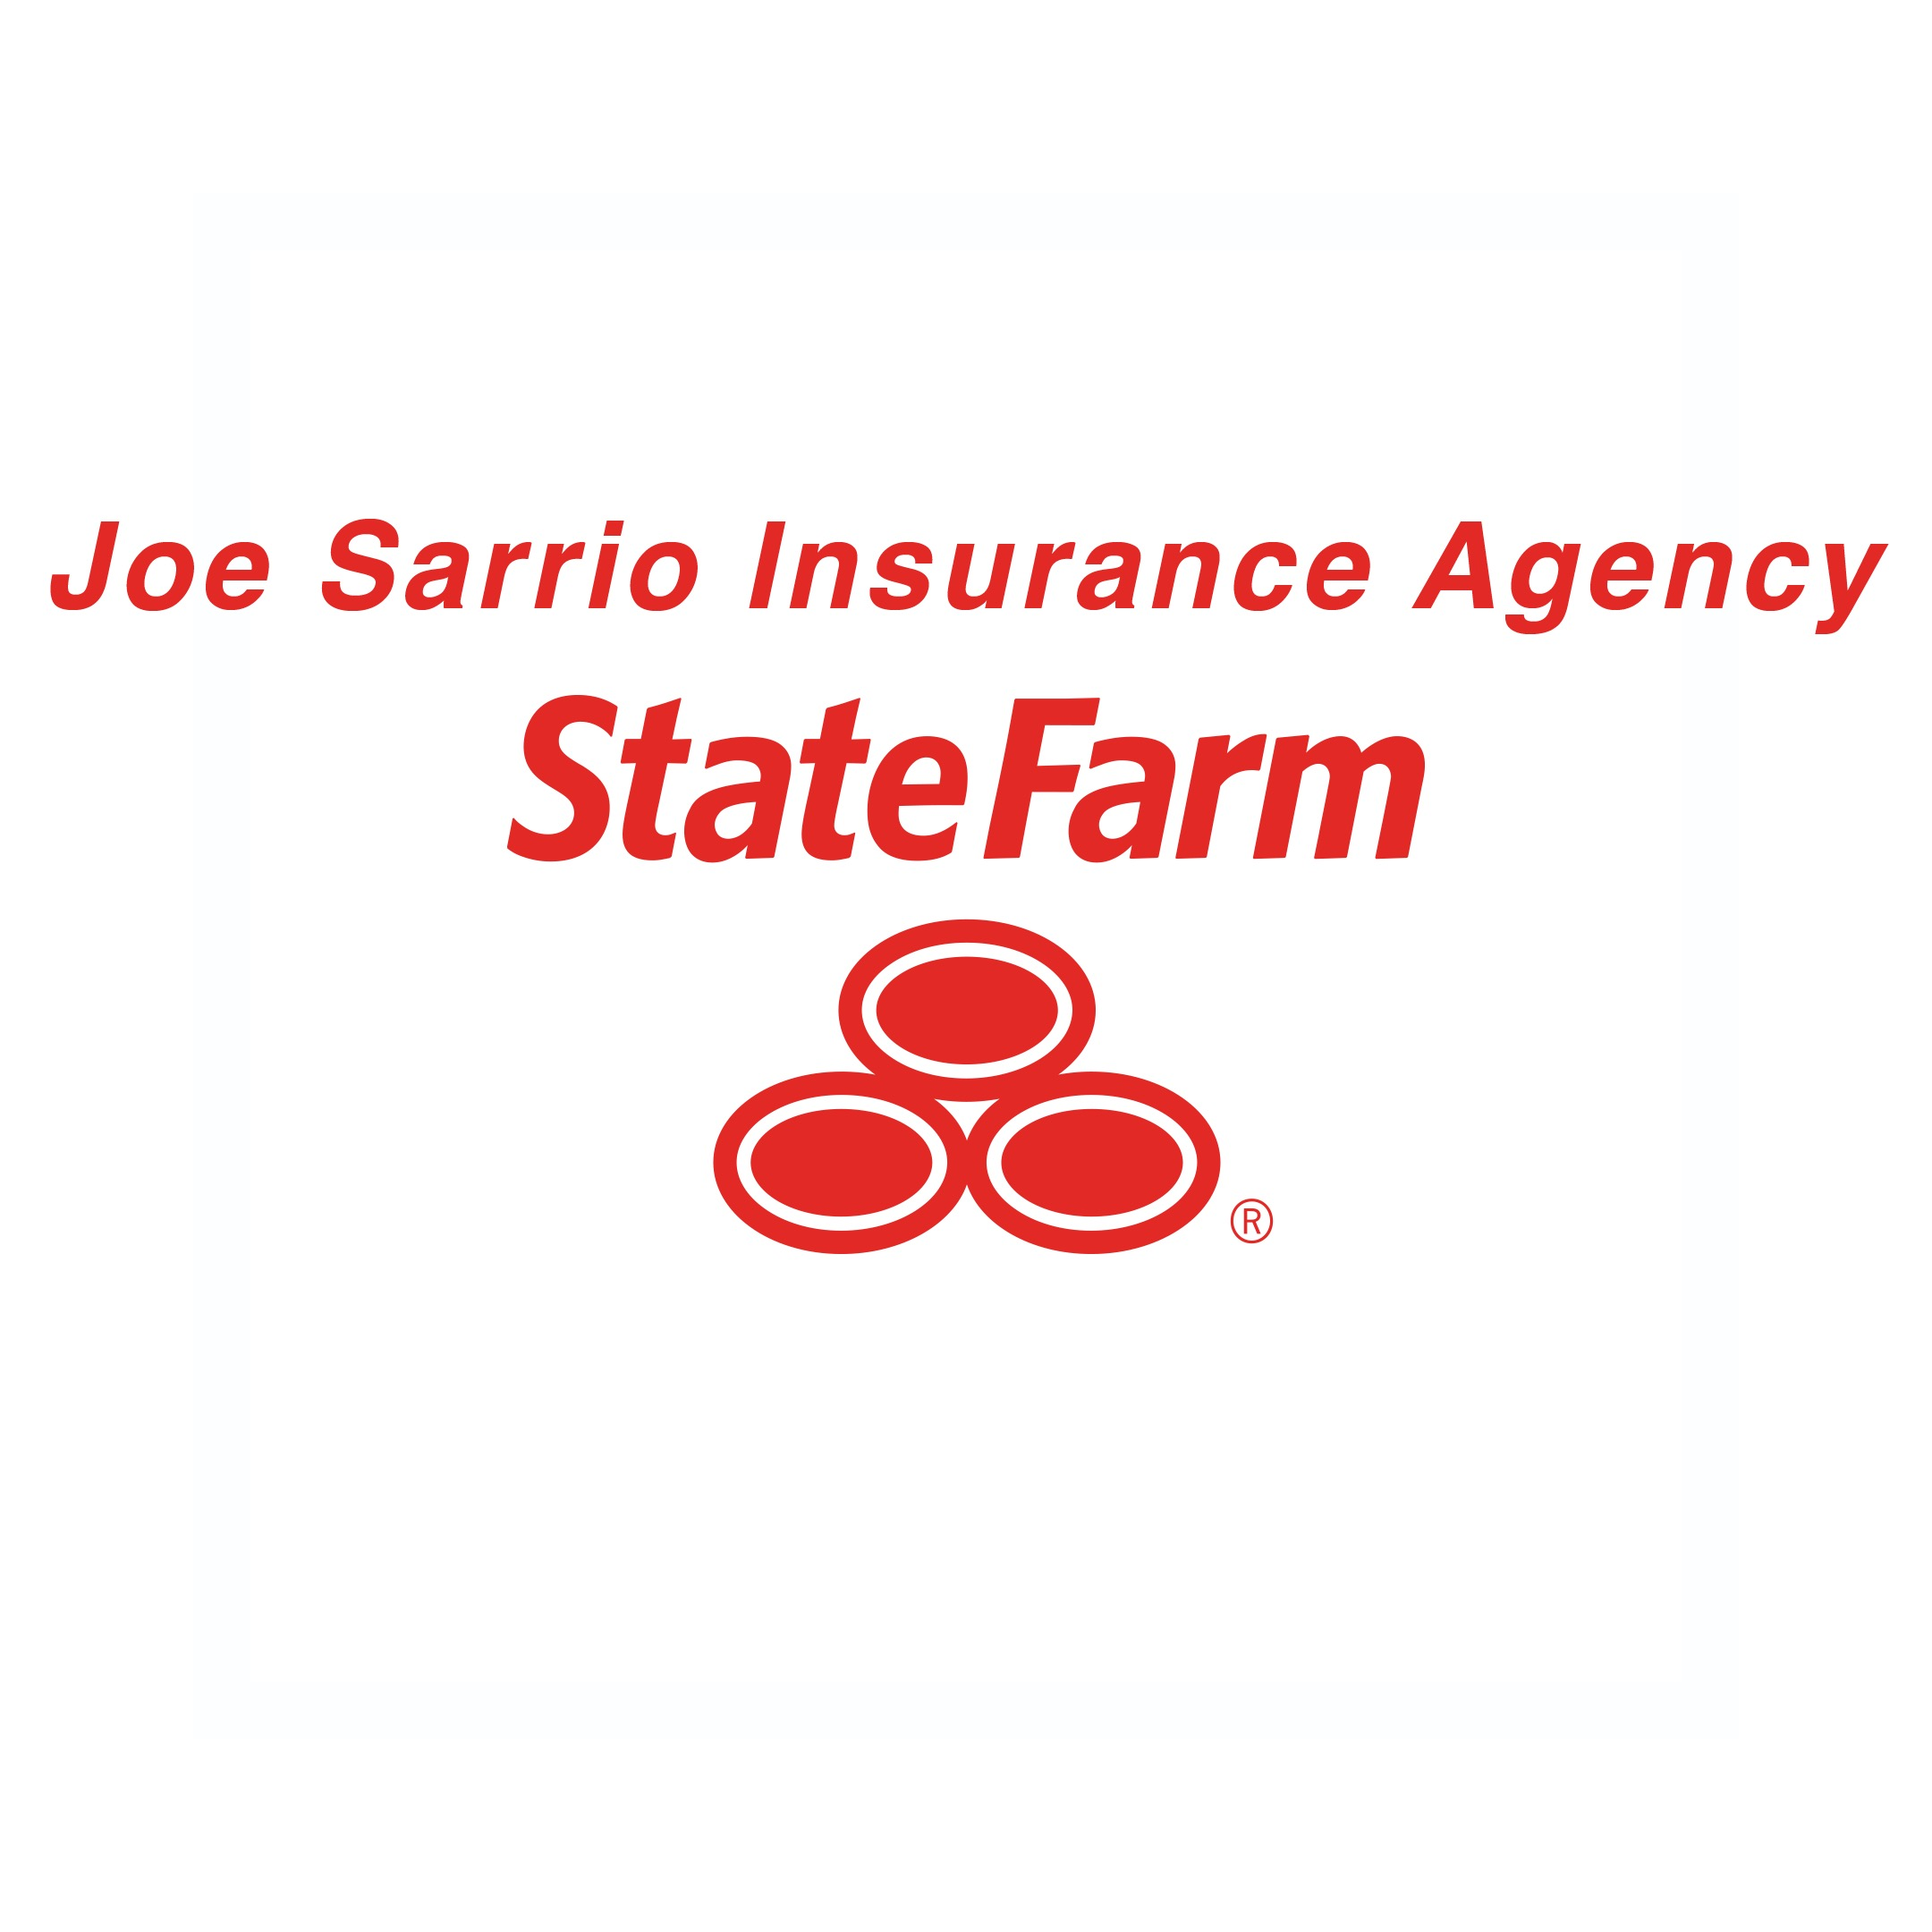 Joe Sarrio Insurance Agency is Hiring Insurance Sales Representative and Insurance Agency Owner